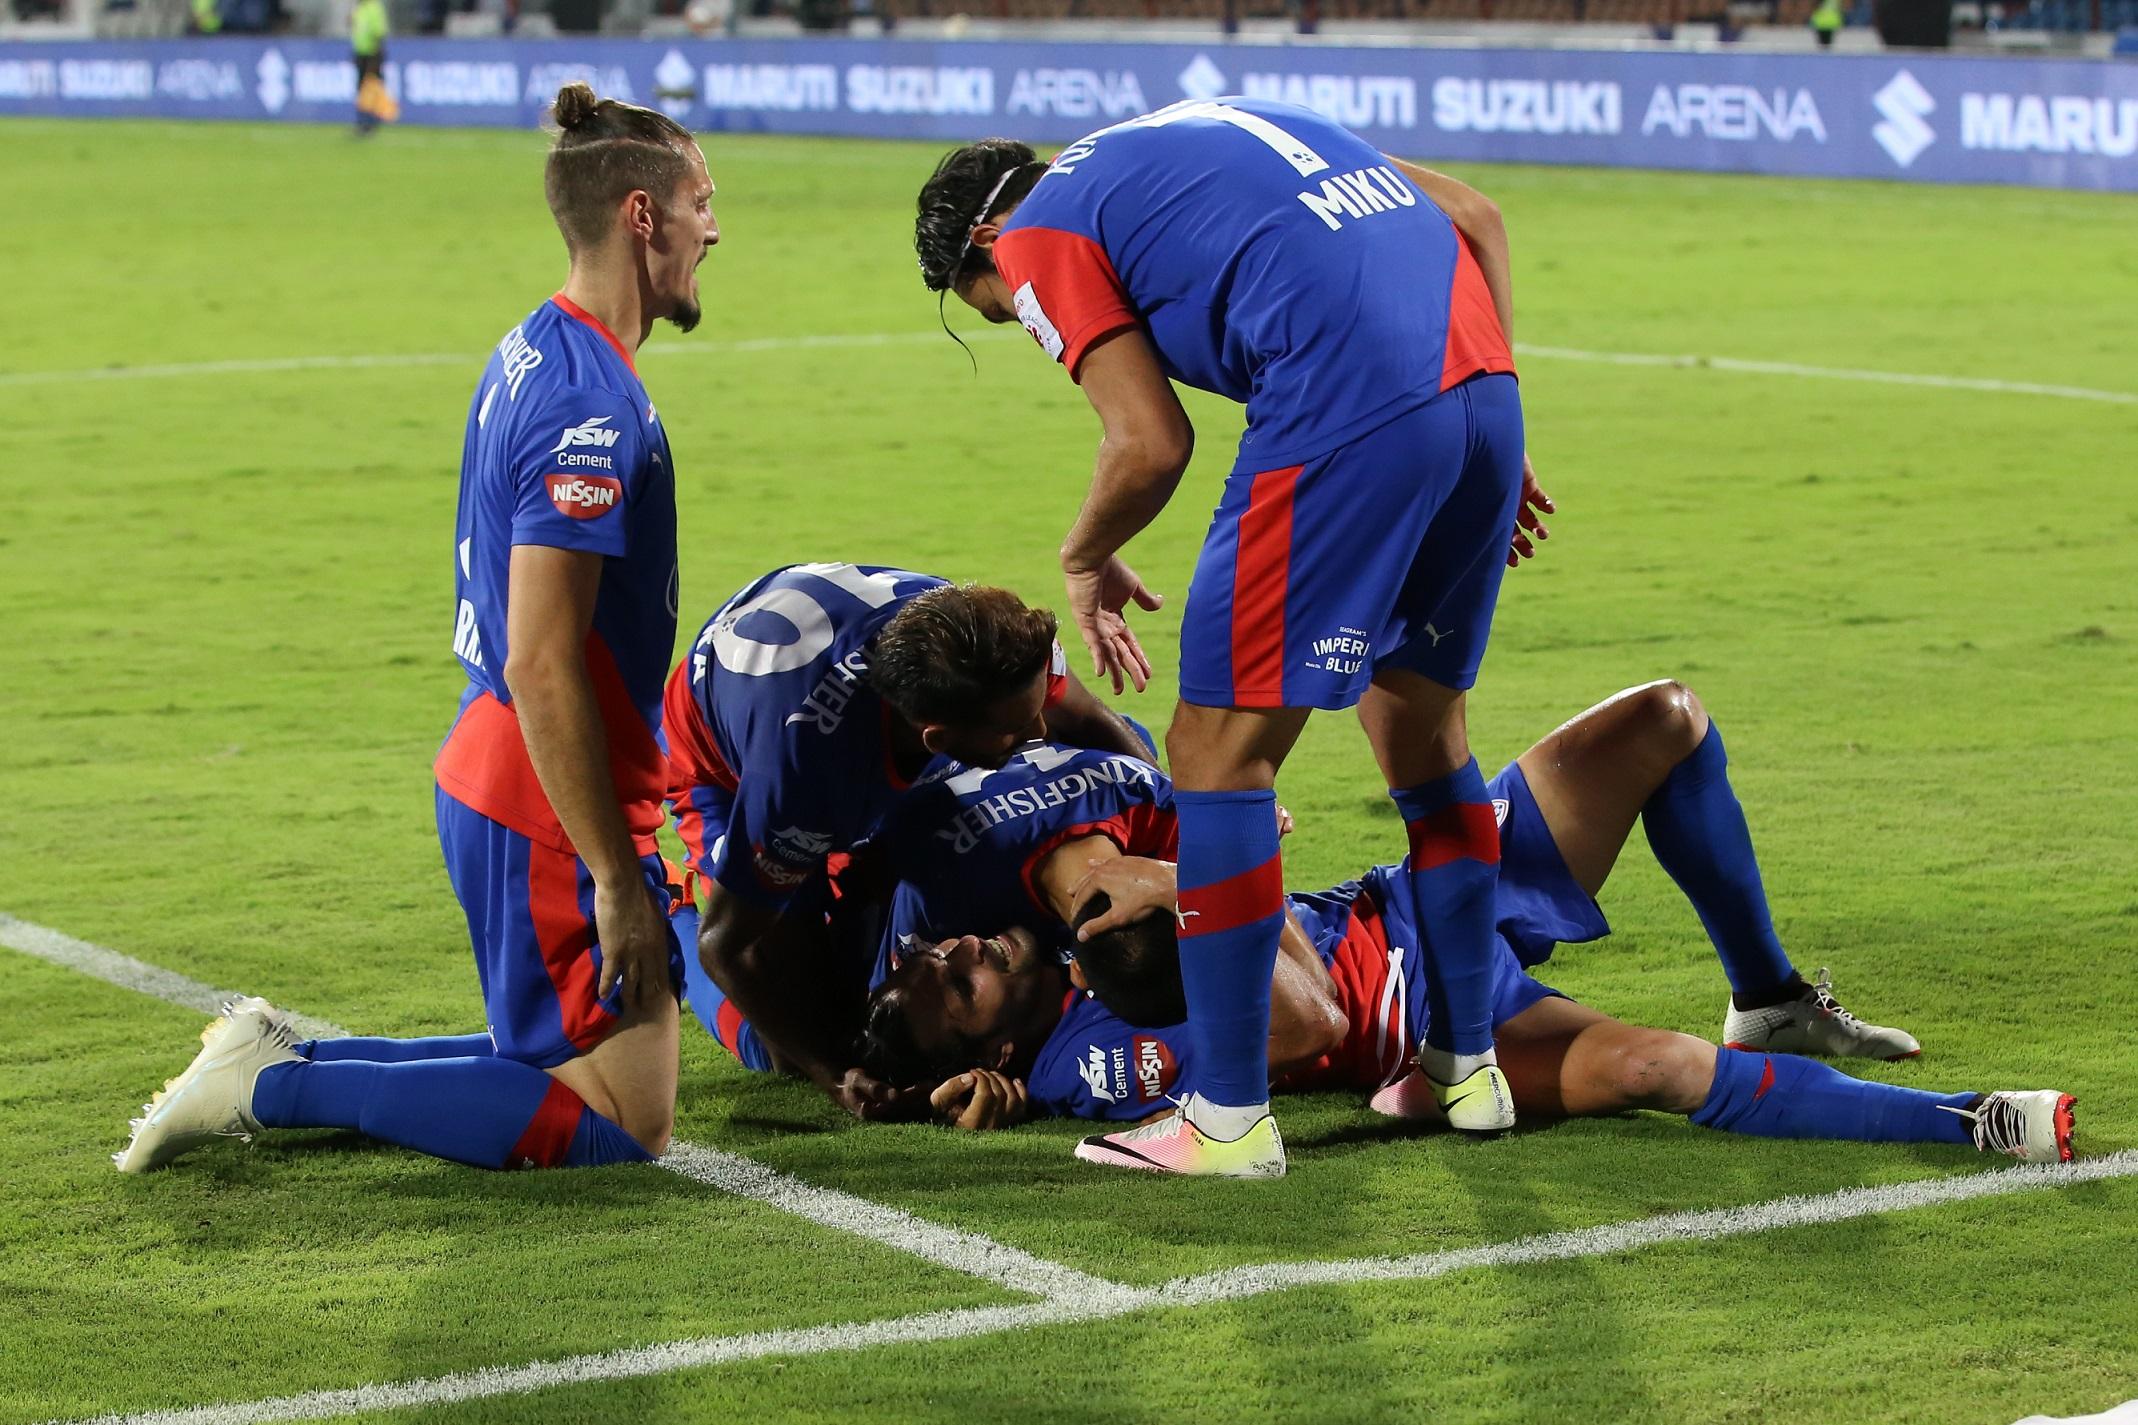 Bengaluru FC vs NorthEast United